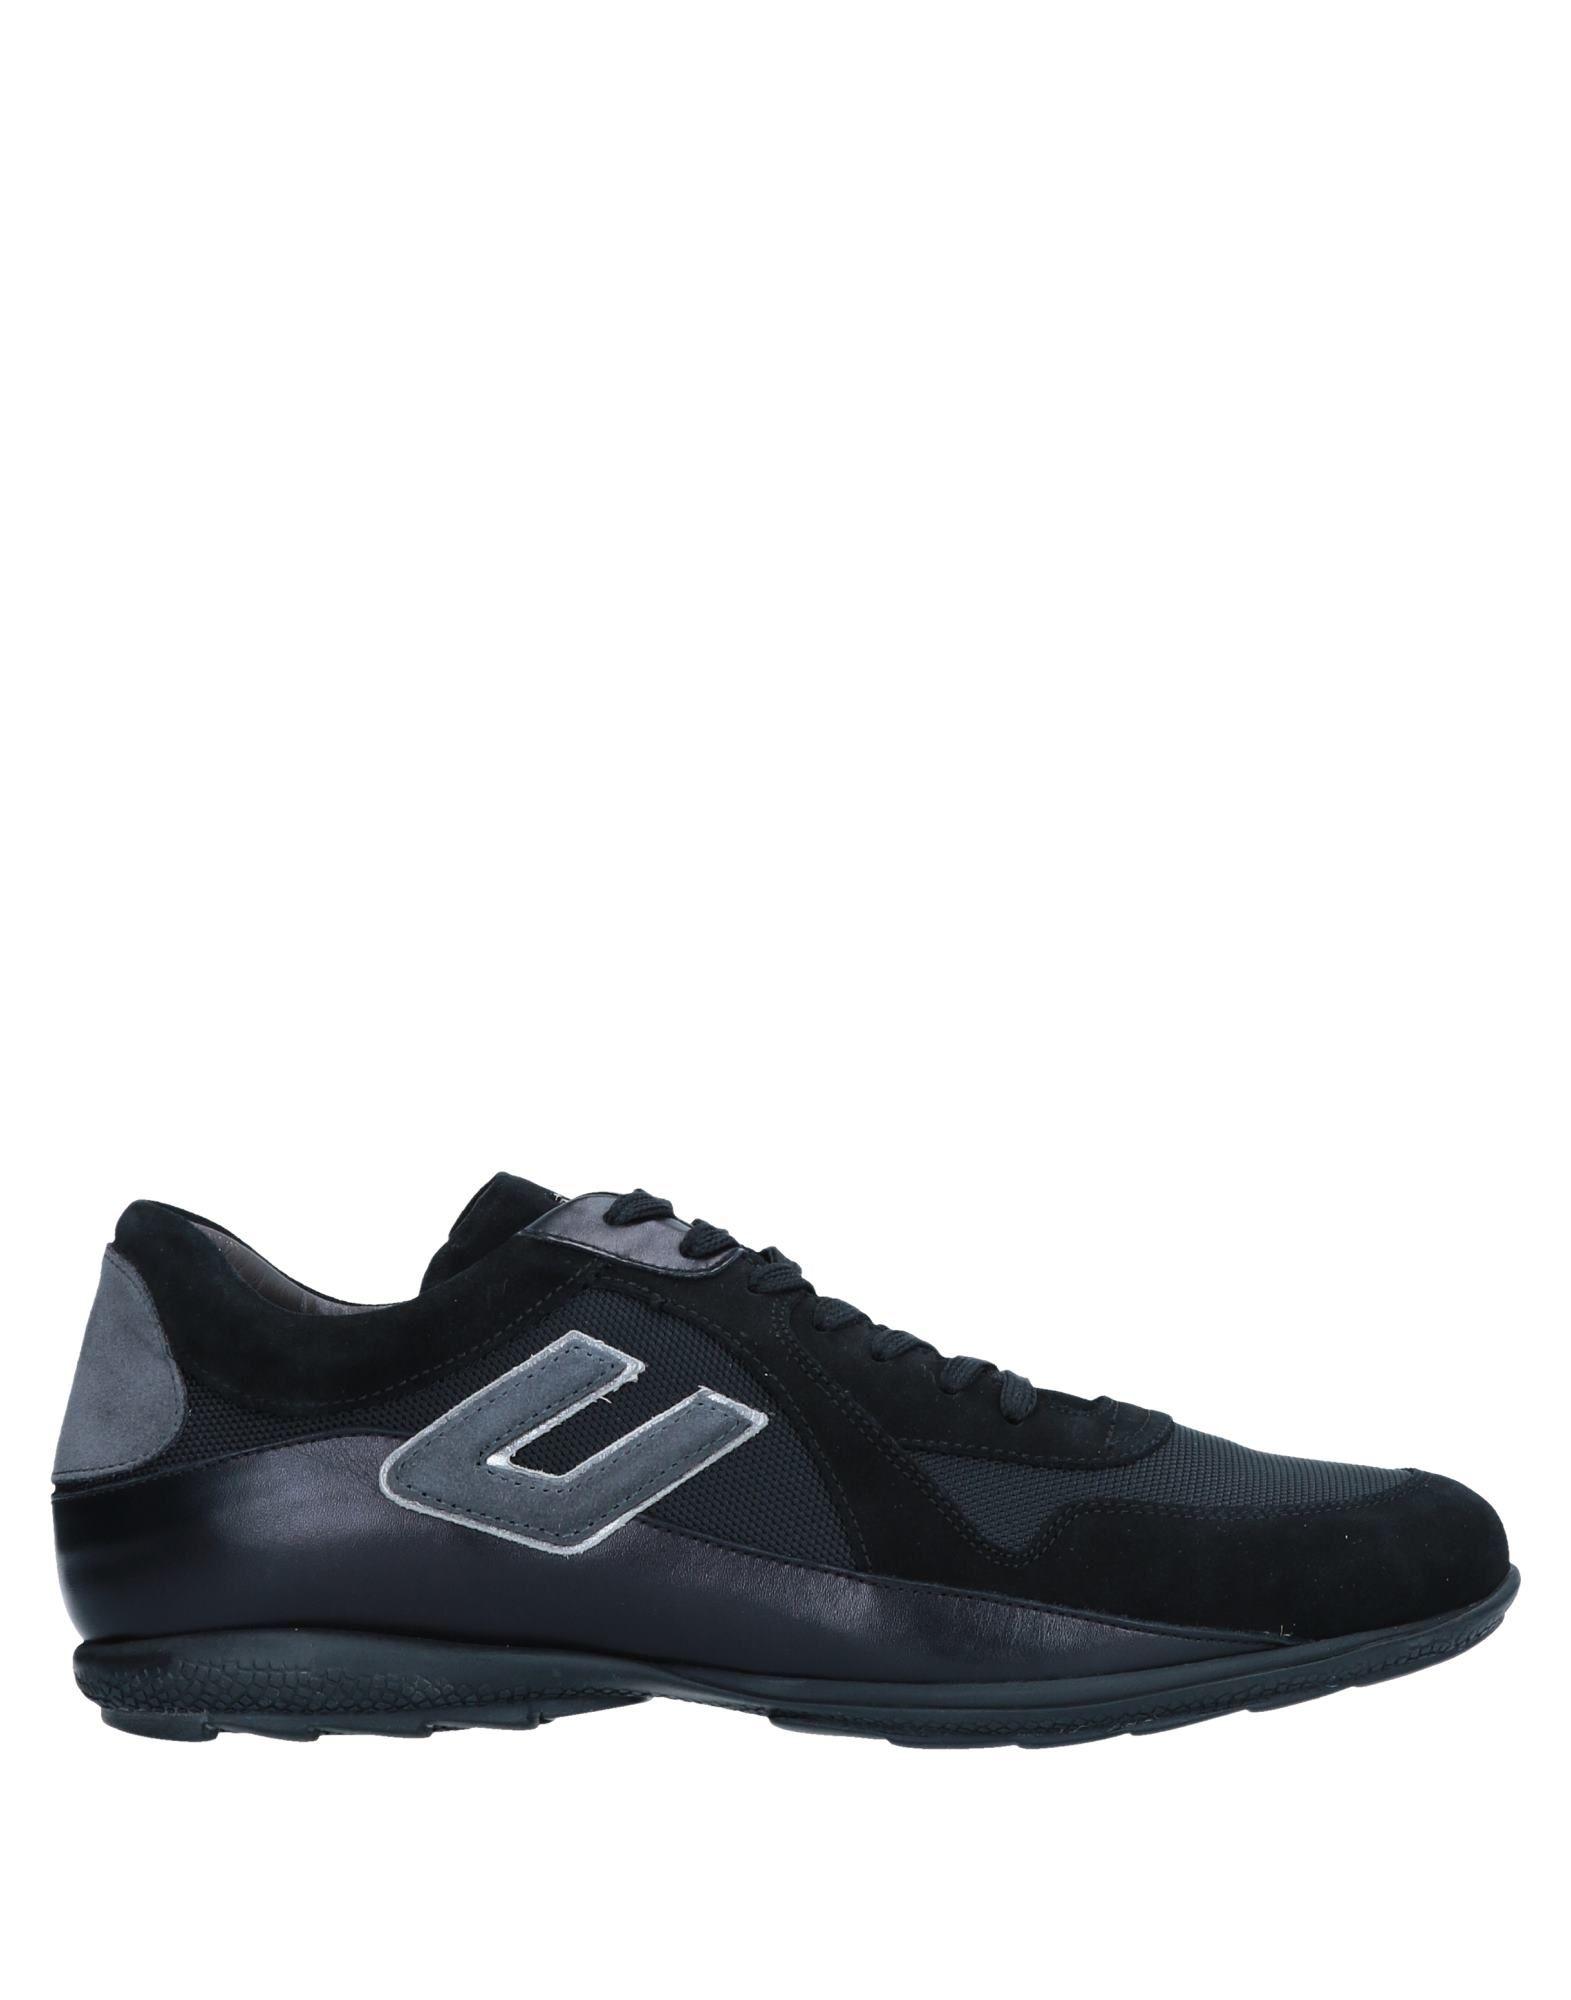 Cesare Paciotti 11556449BI 4Us Sneakers Herren  11556449BI Paciotti Gute Qualität beliebte Schuhe aa9061